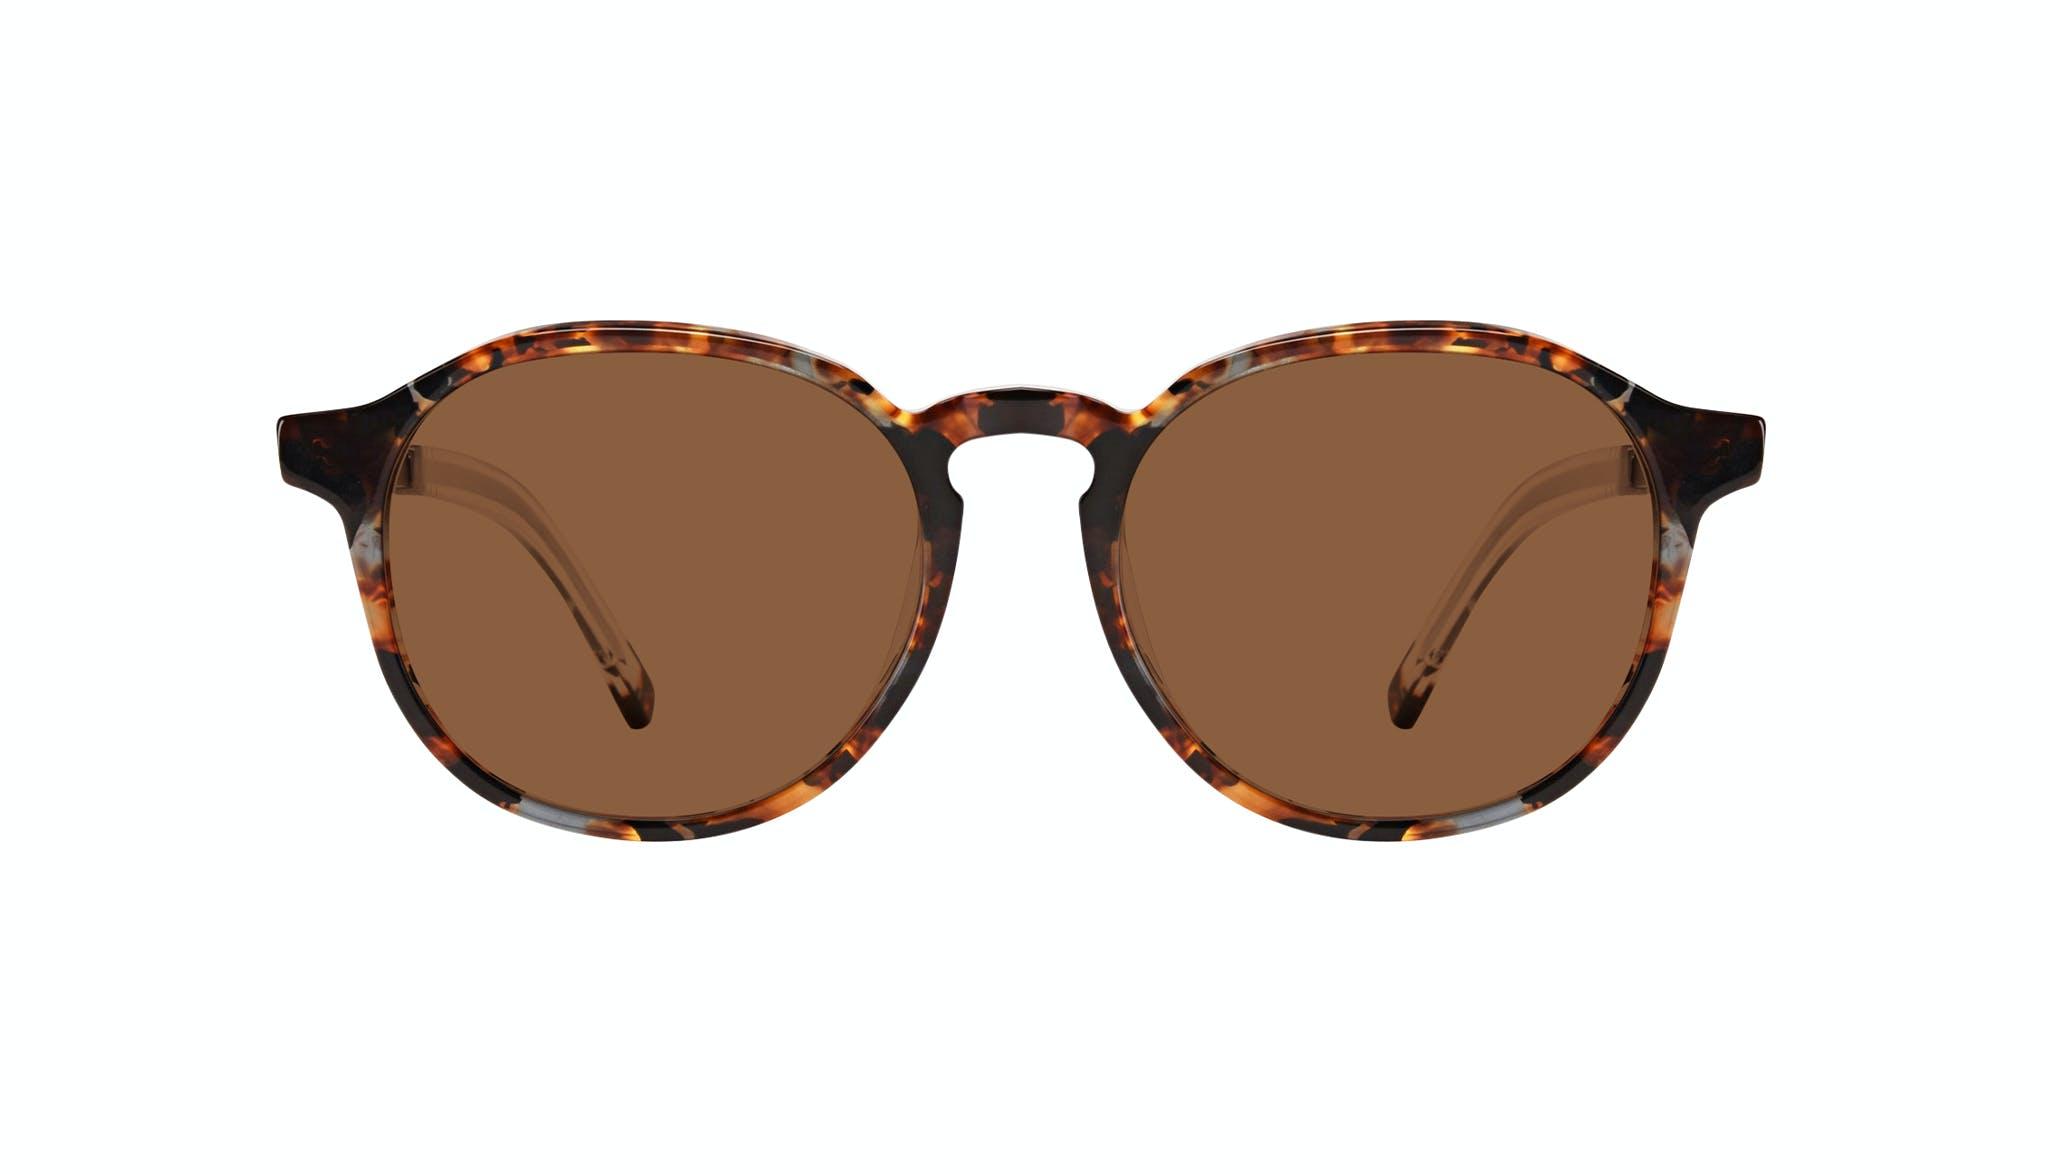 Affordable Fashion Glasses Round Eyeglasses Men Prime XL Mahogany